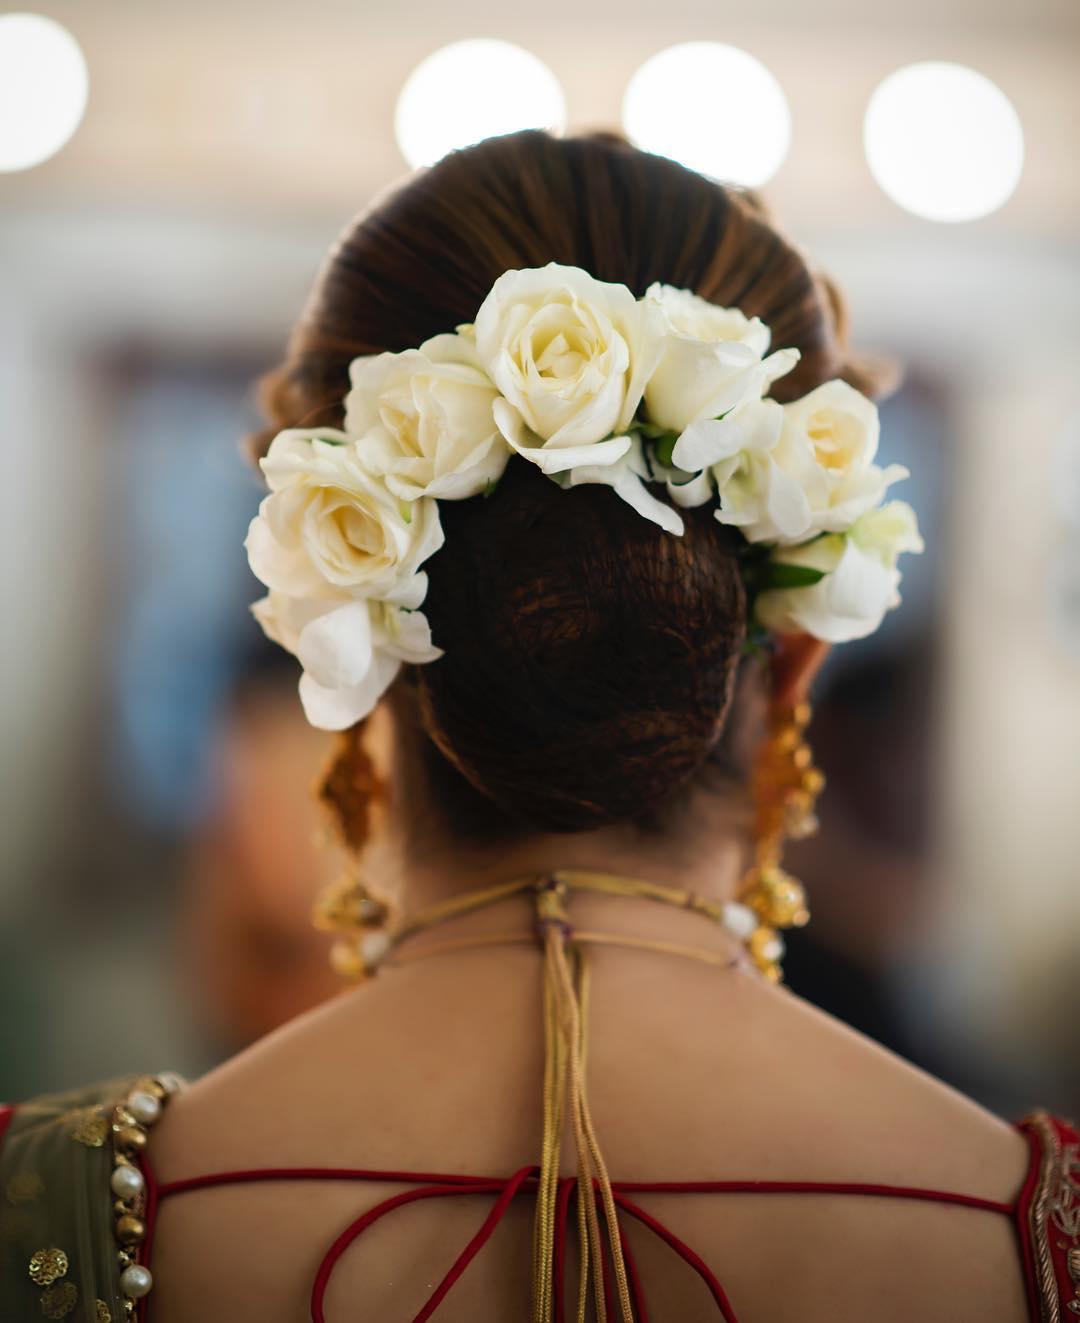 Floral Bun Hairstyles for Brides White rose floral bun: Top 15 Floral Bun Hairstyles for Brides this Wedding Season